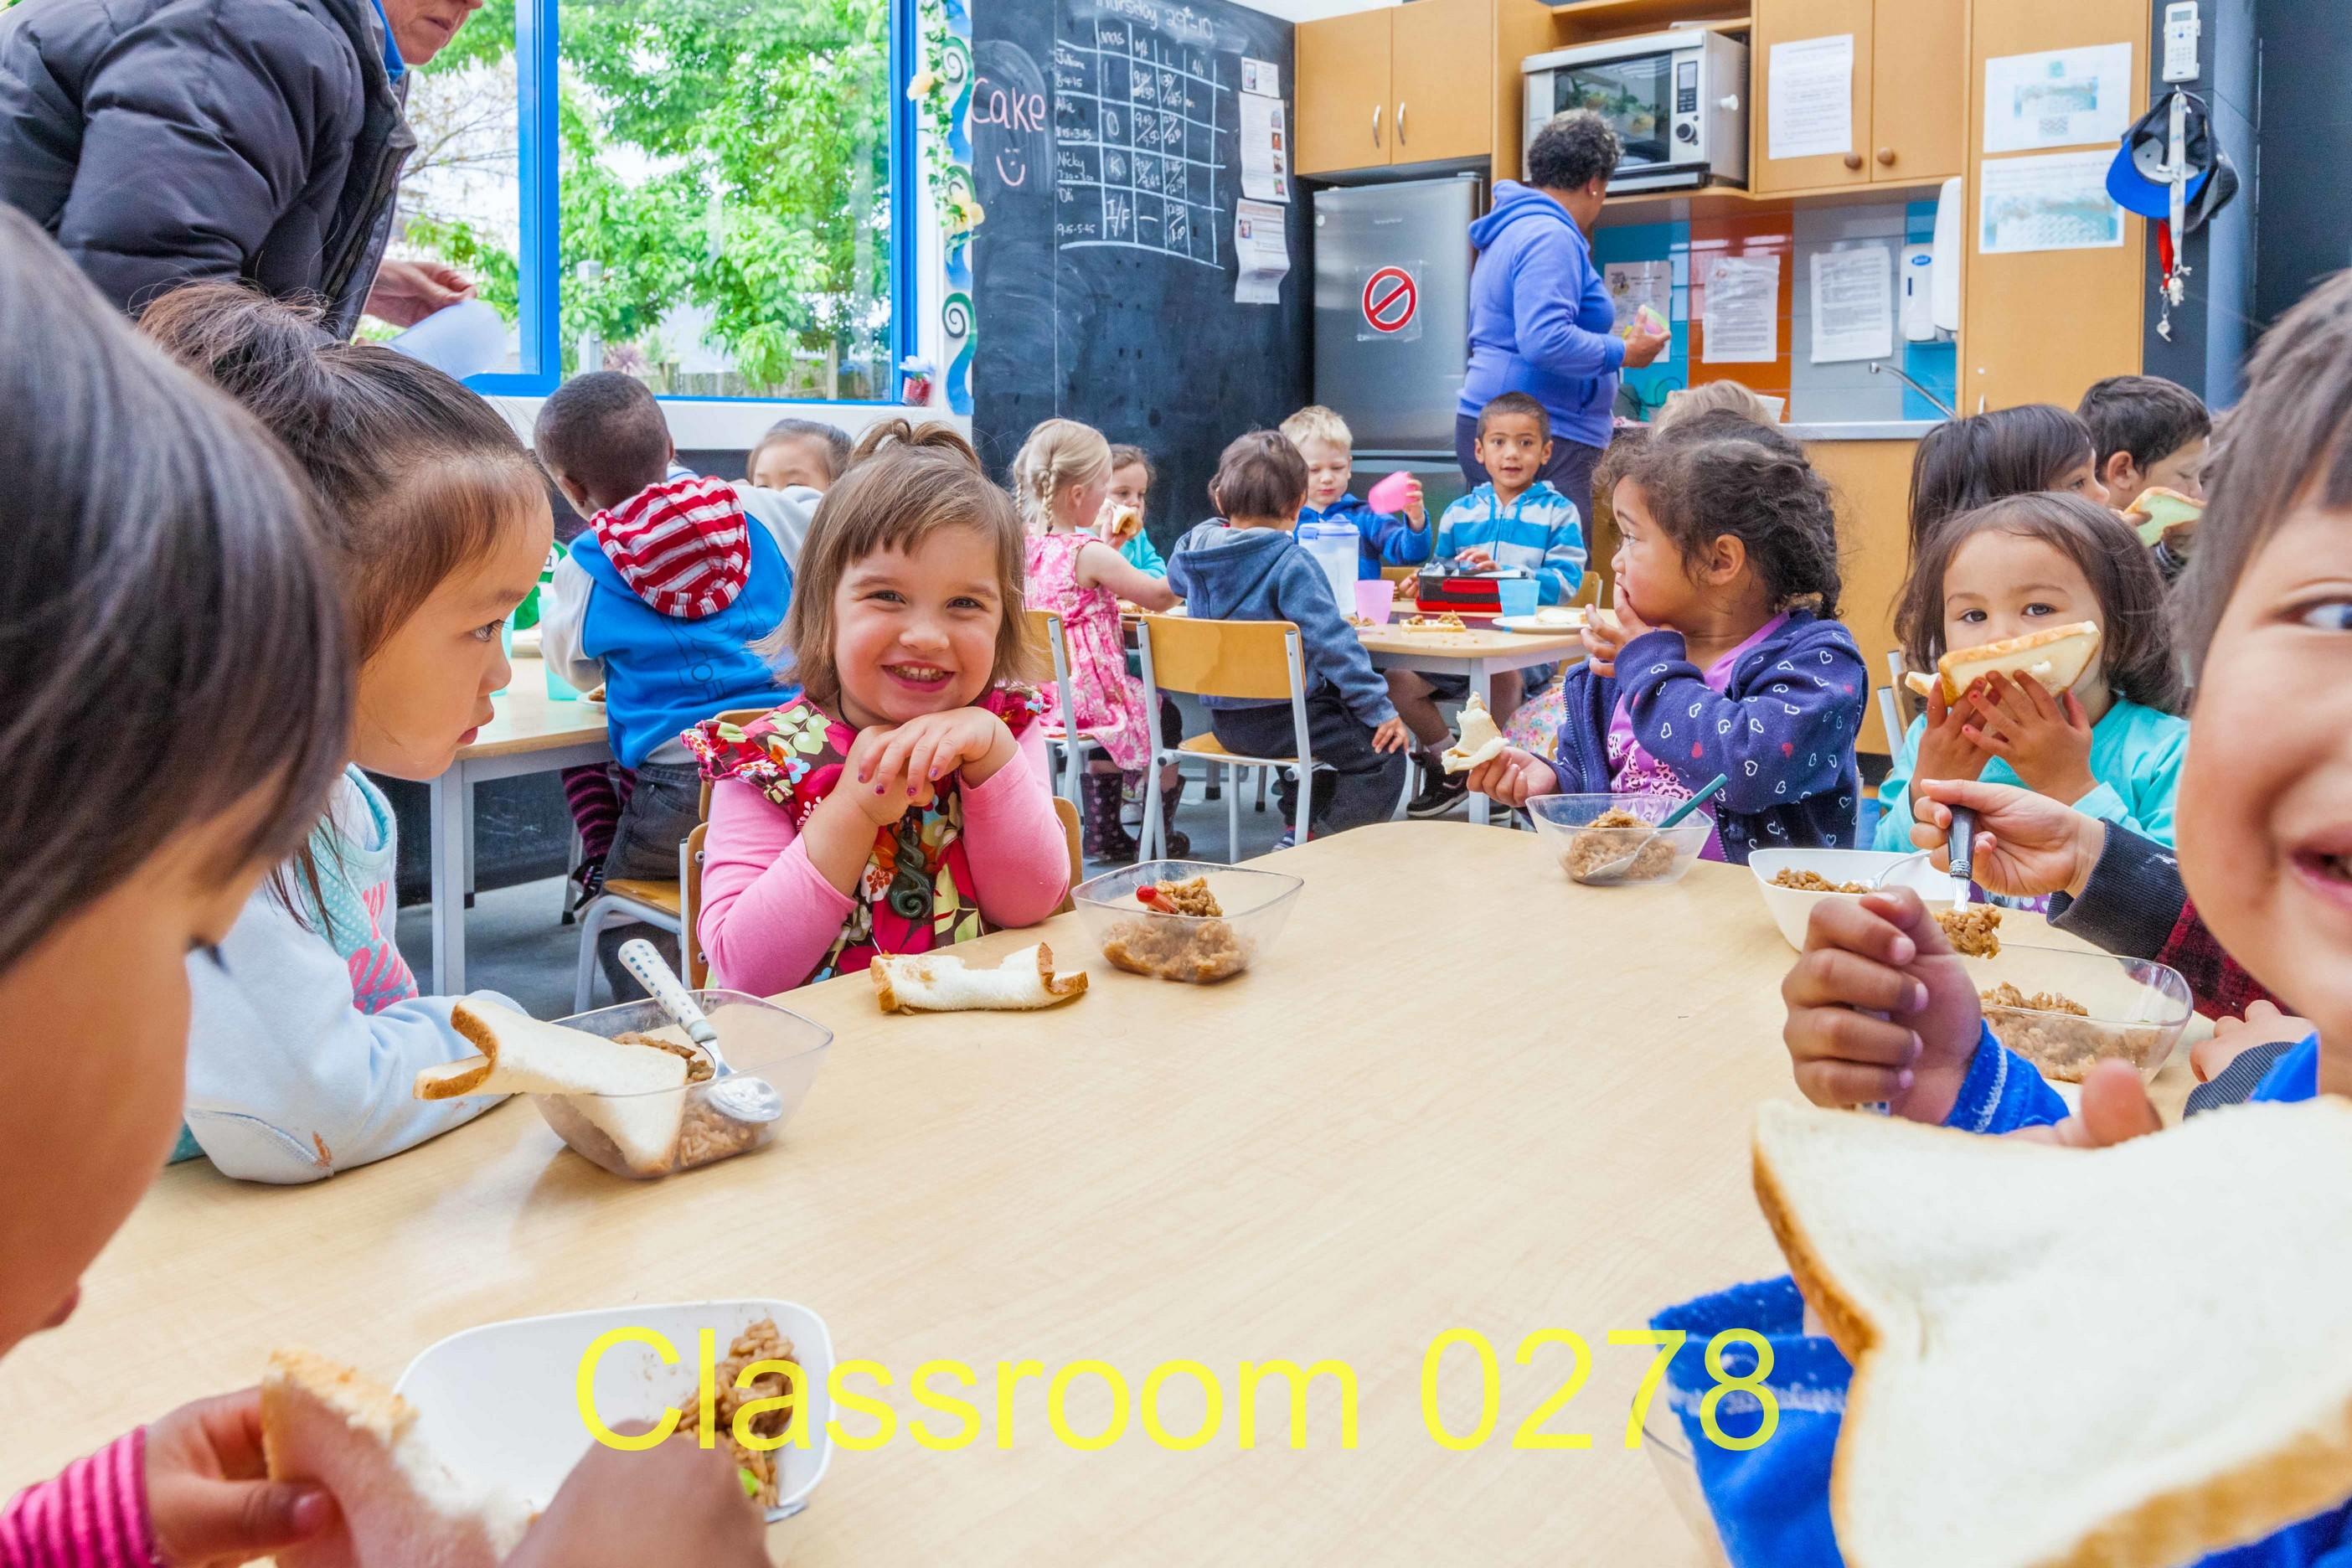 Classroom 0278